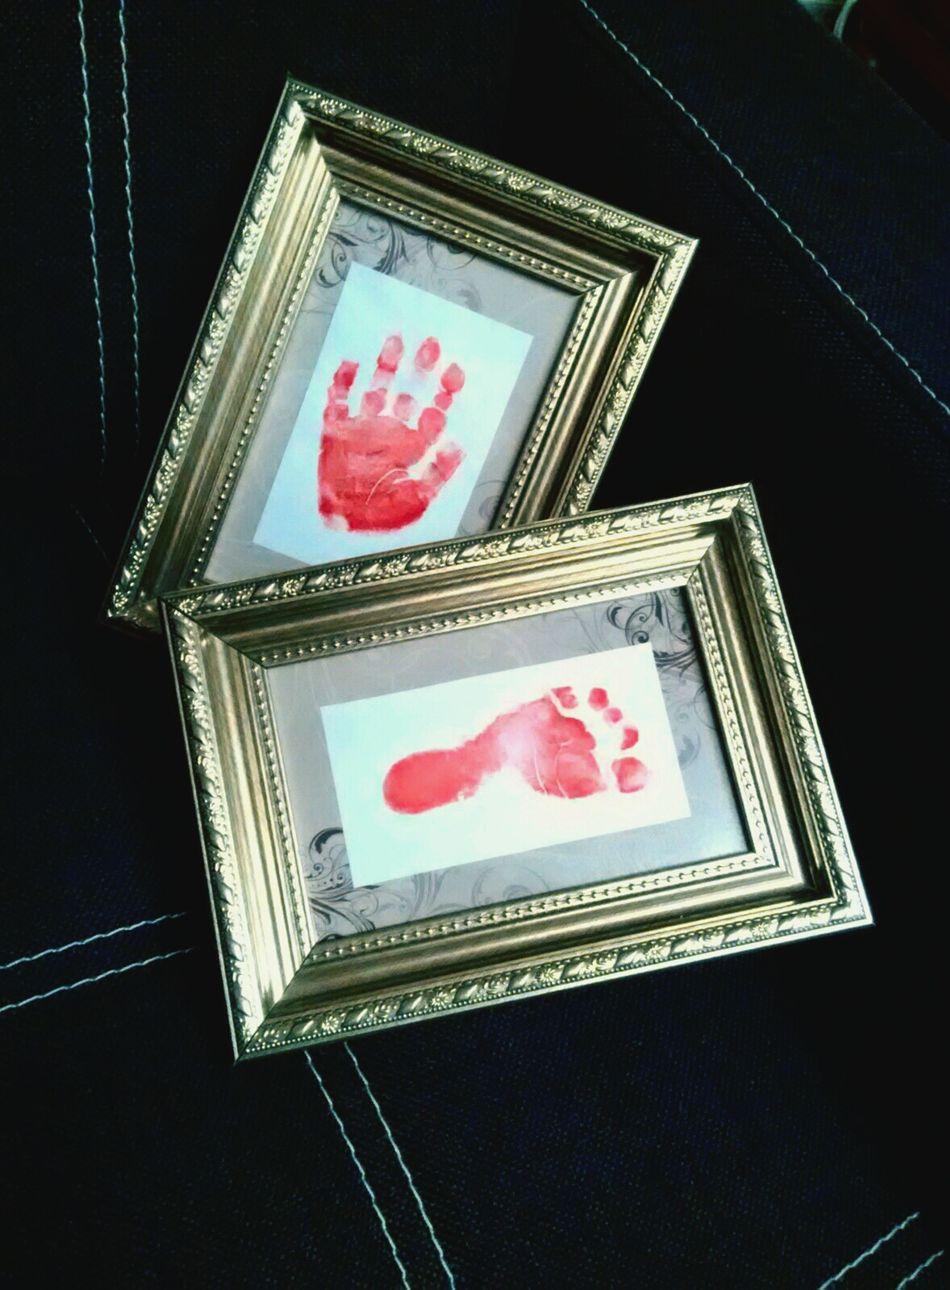 Handprint FootPrint Handprints HandPrinted Baby Handprint Footprints Handprinting Handmade Frame Golden Frame Art ArtWork Masterpiece Masterpieces Gallery Family Baby Red Gold Print Arte Art? 43 Golden Moments Love FamilyLove